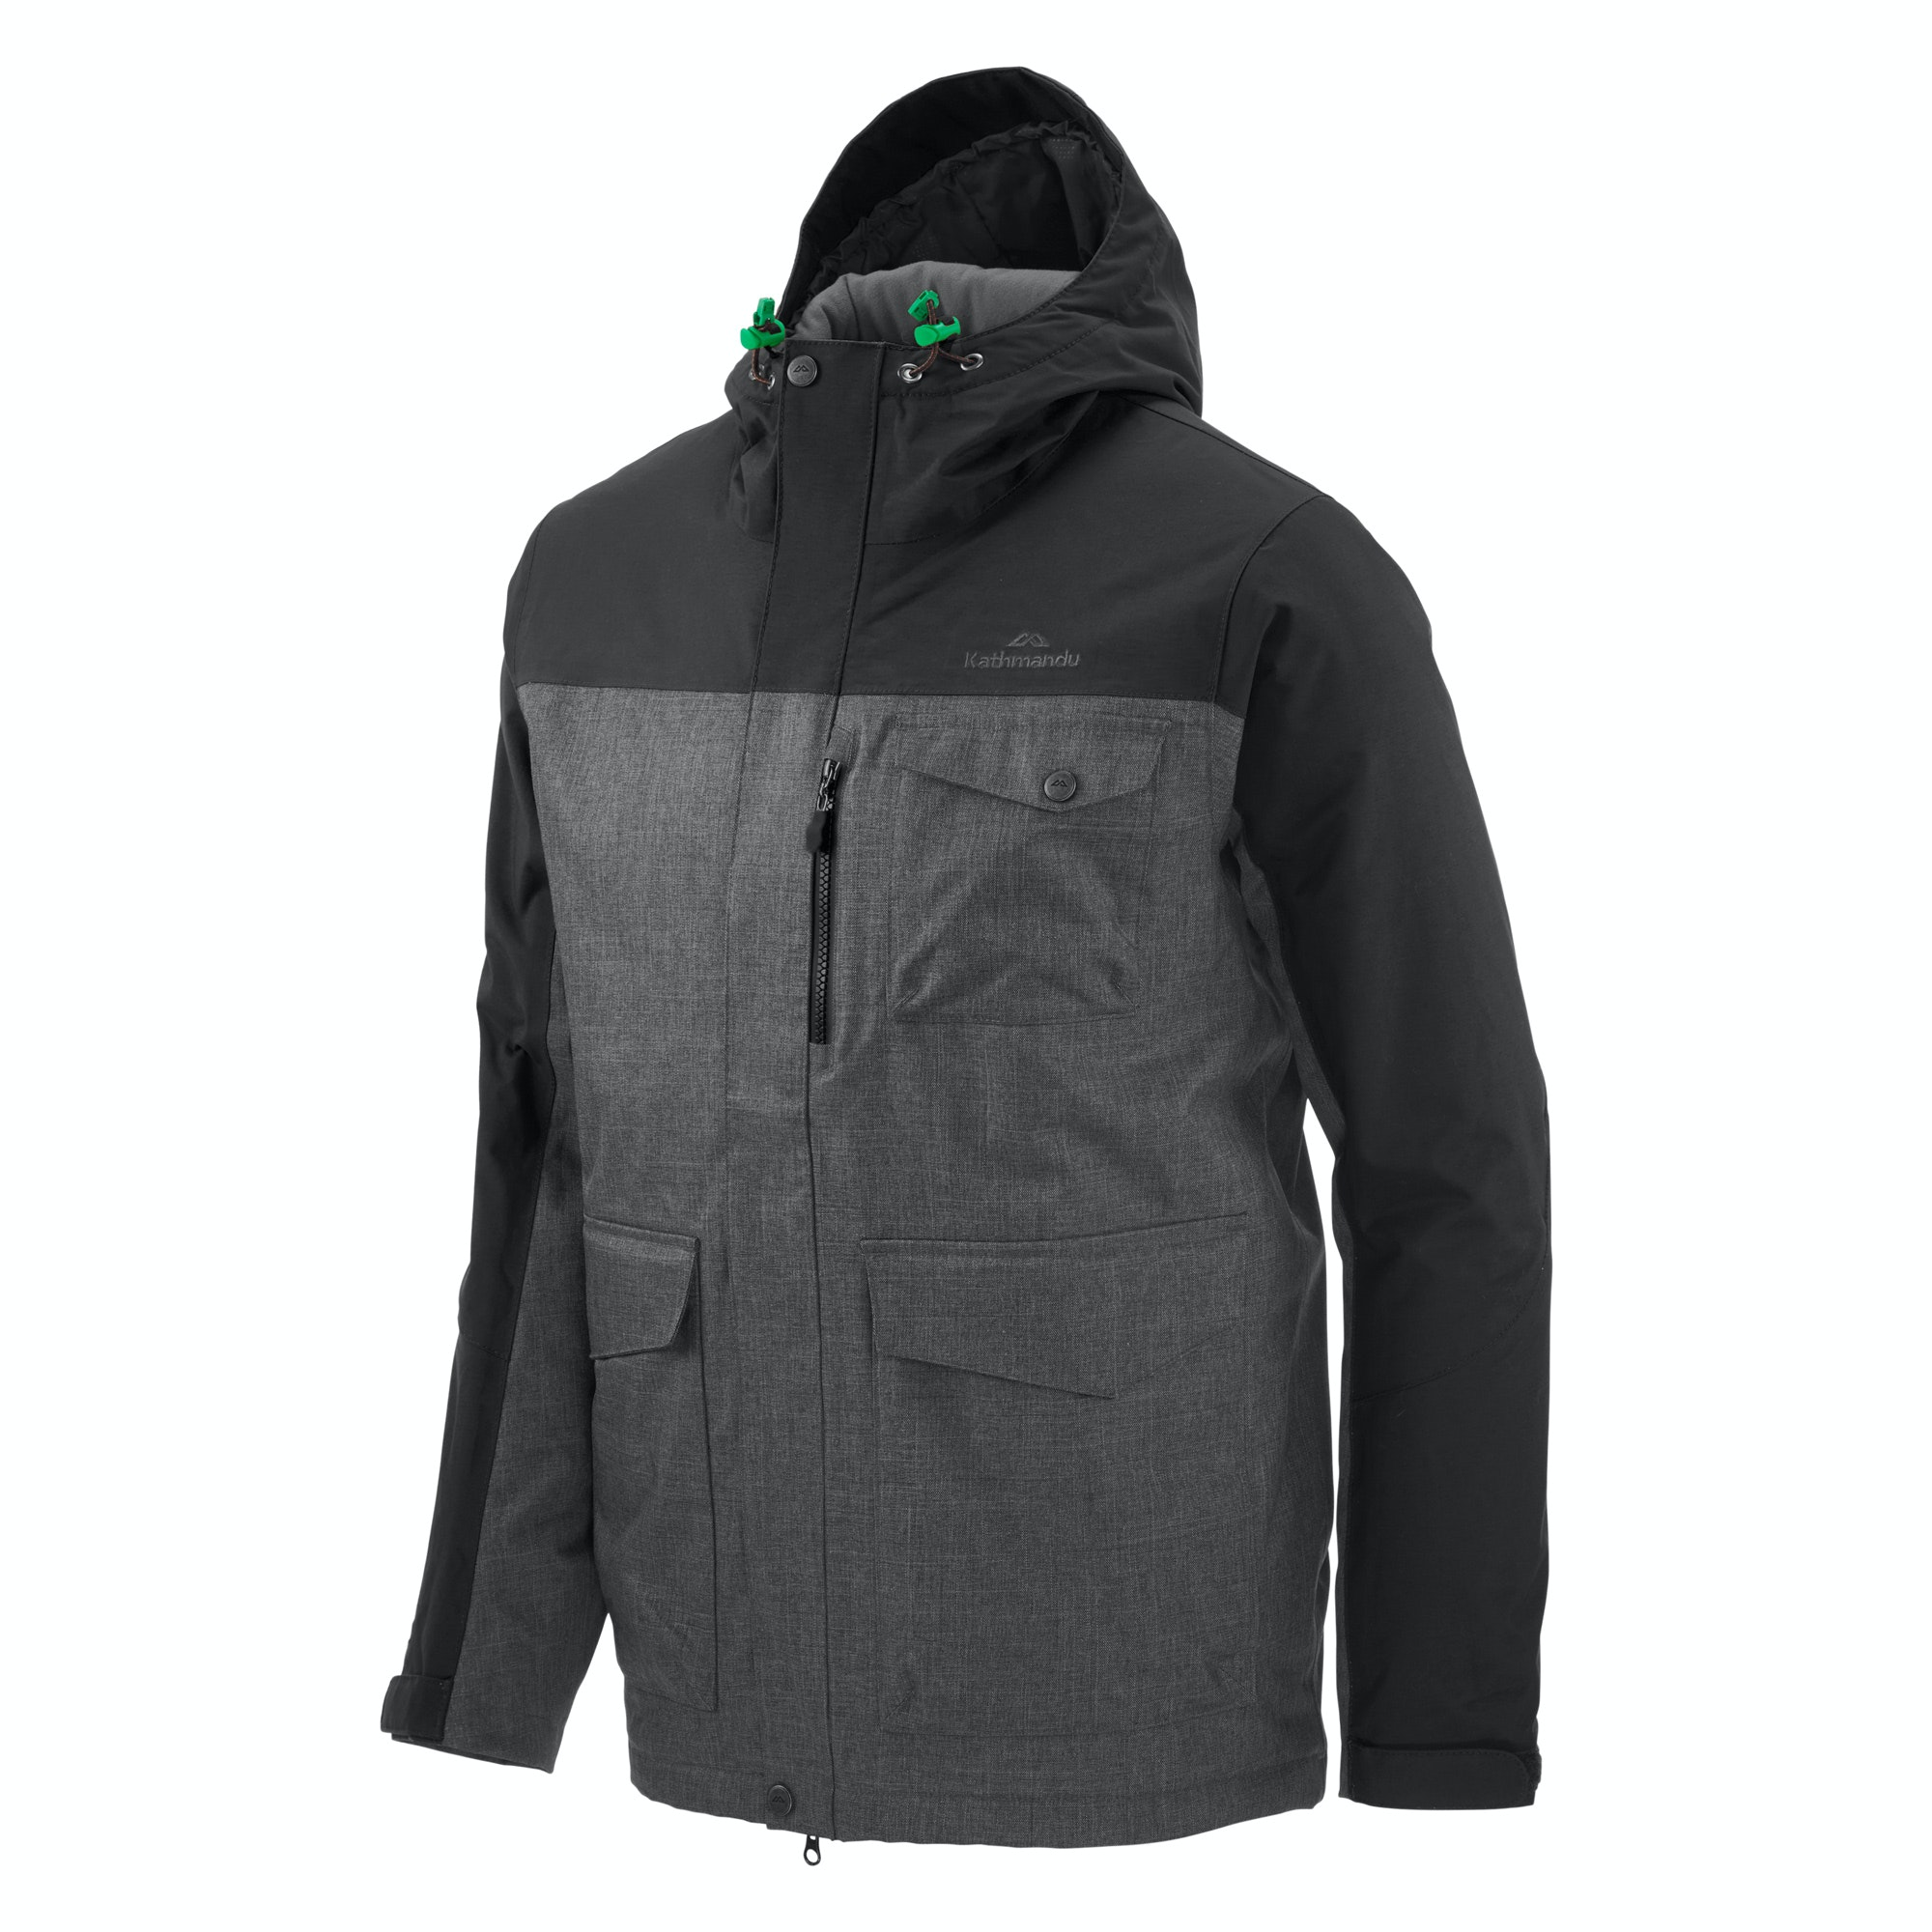 680878c73b Buy Kathmandu Teton Mens 2 Layer Waterproof Snow Ski Hooded Jacket ...